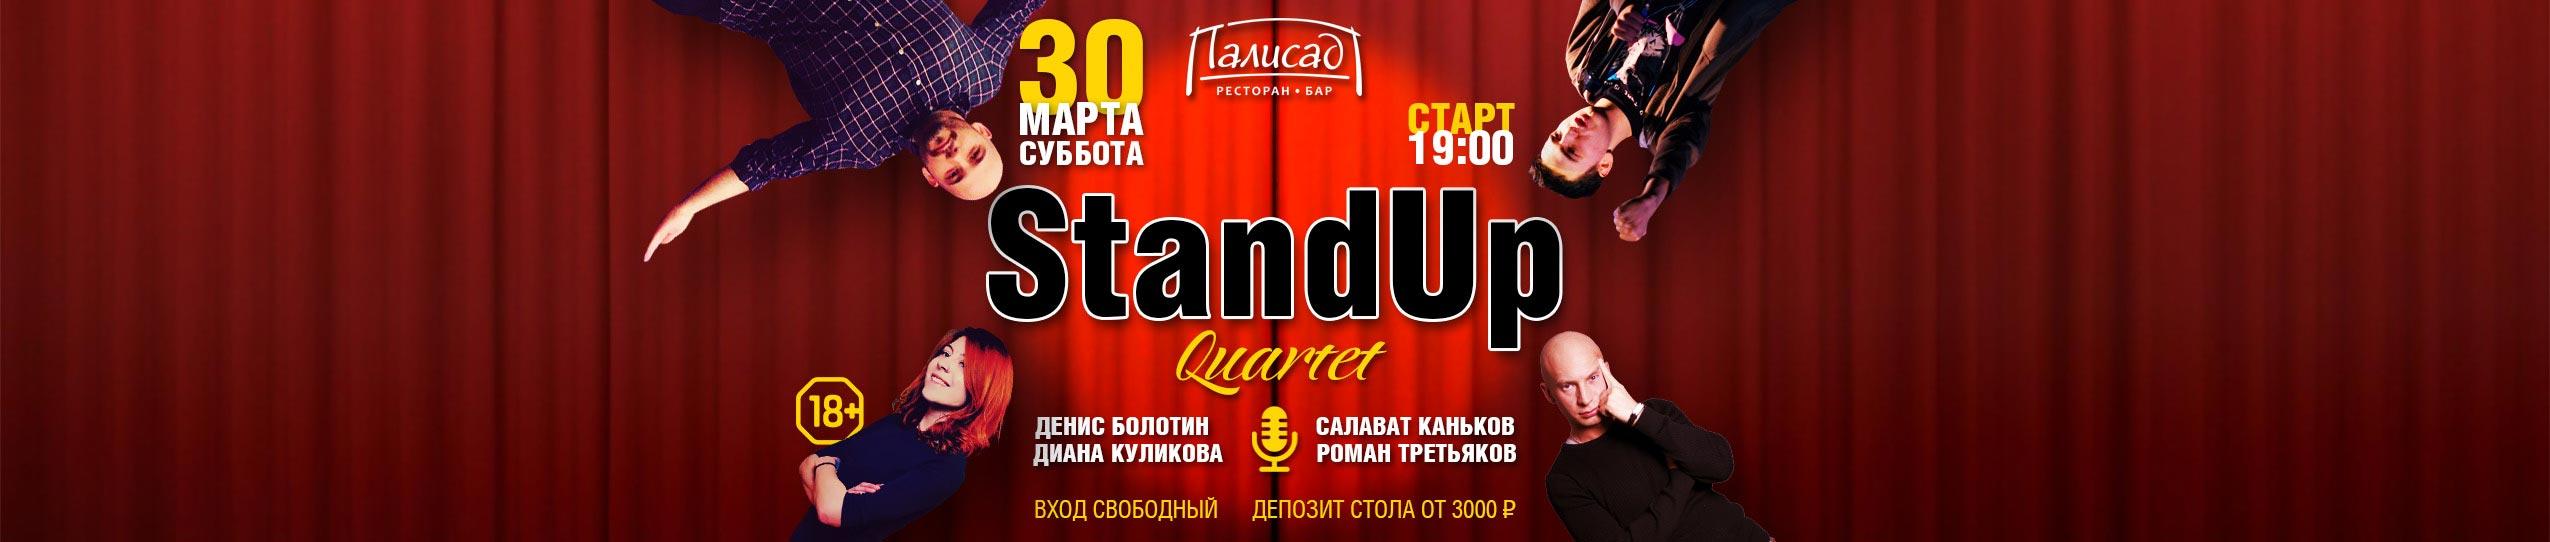 StandUp-Quartet